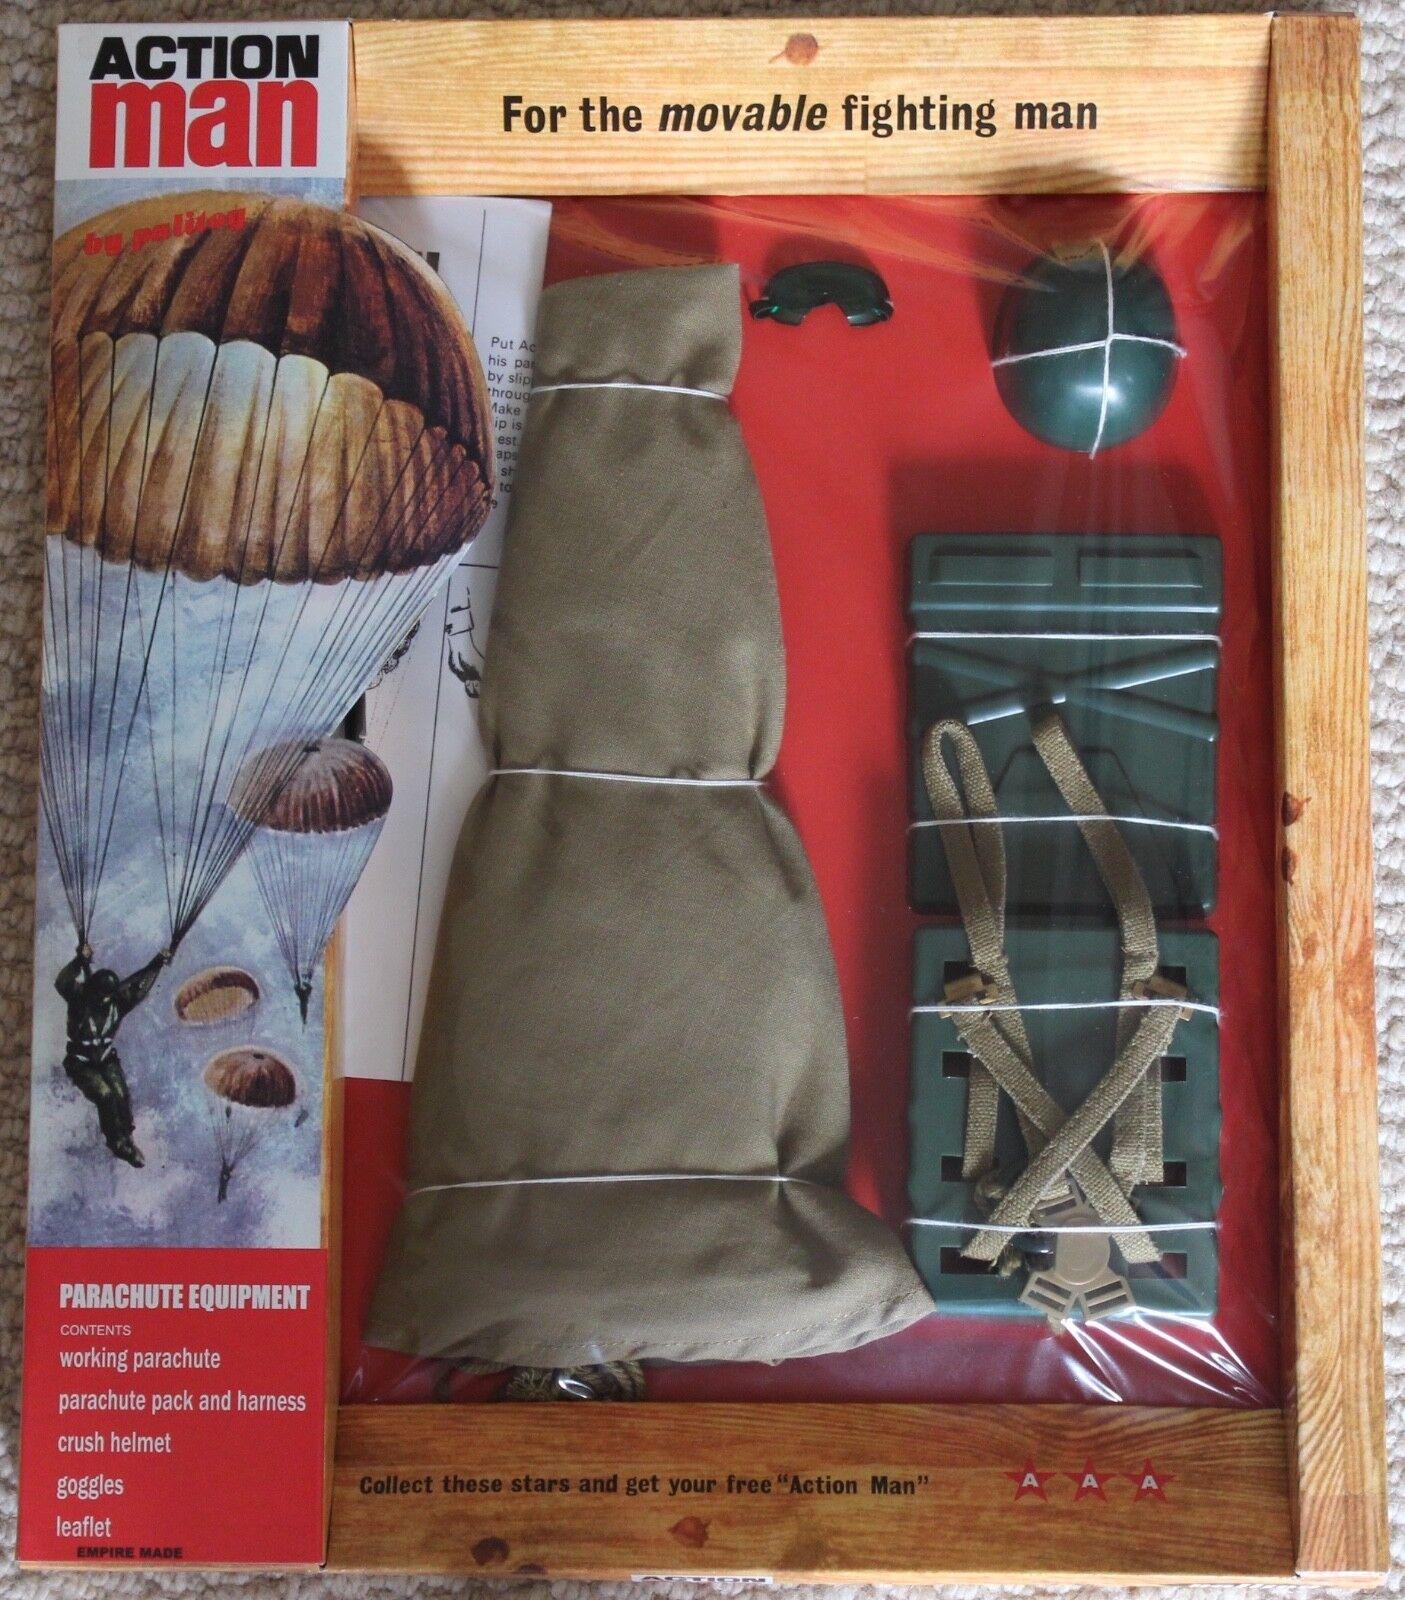 Vintage action man 40th anniversary parachute equipment  set card boxed